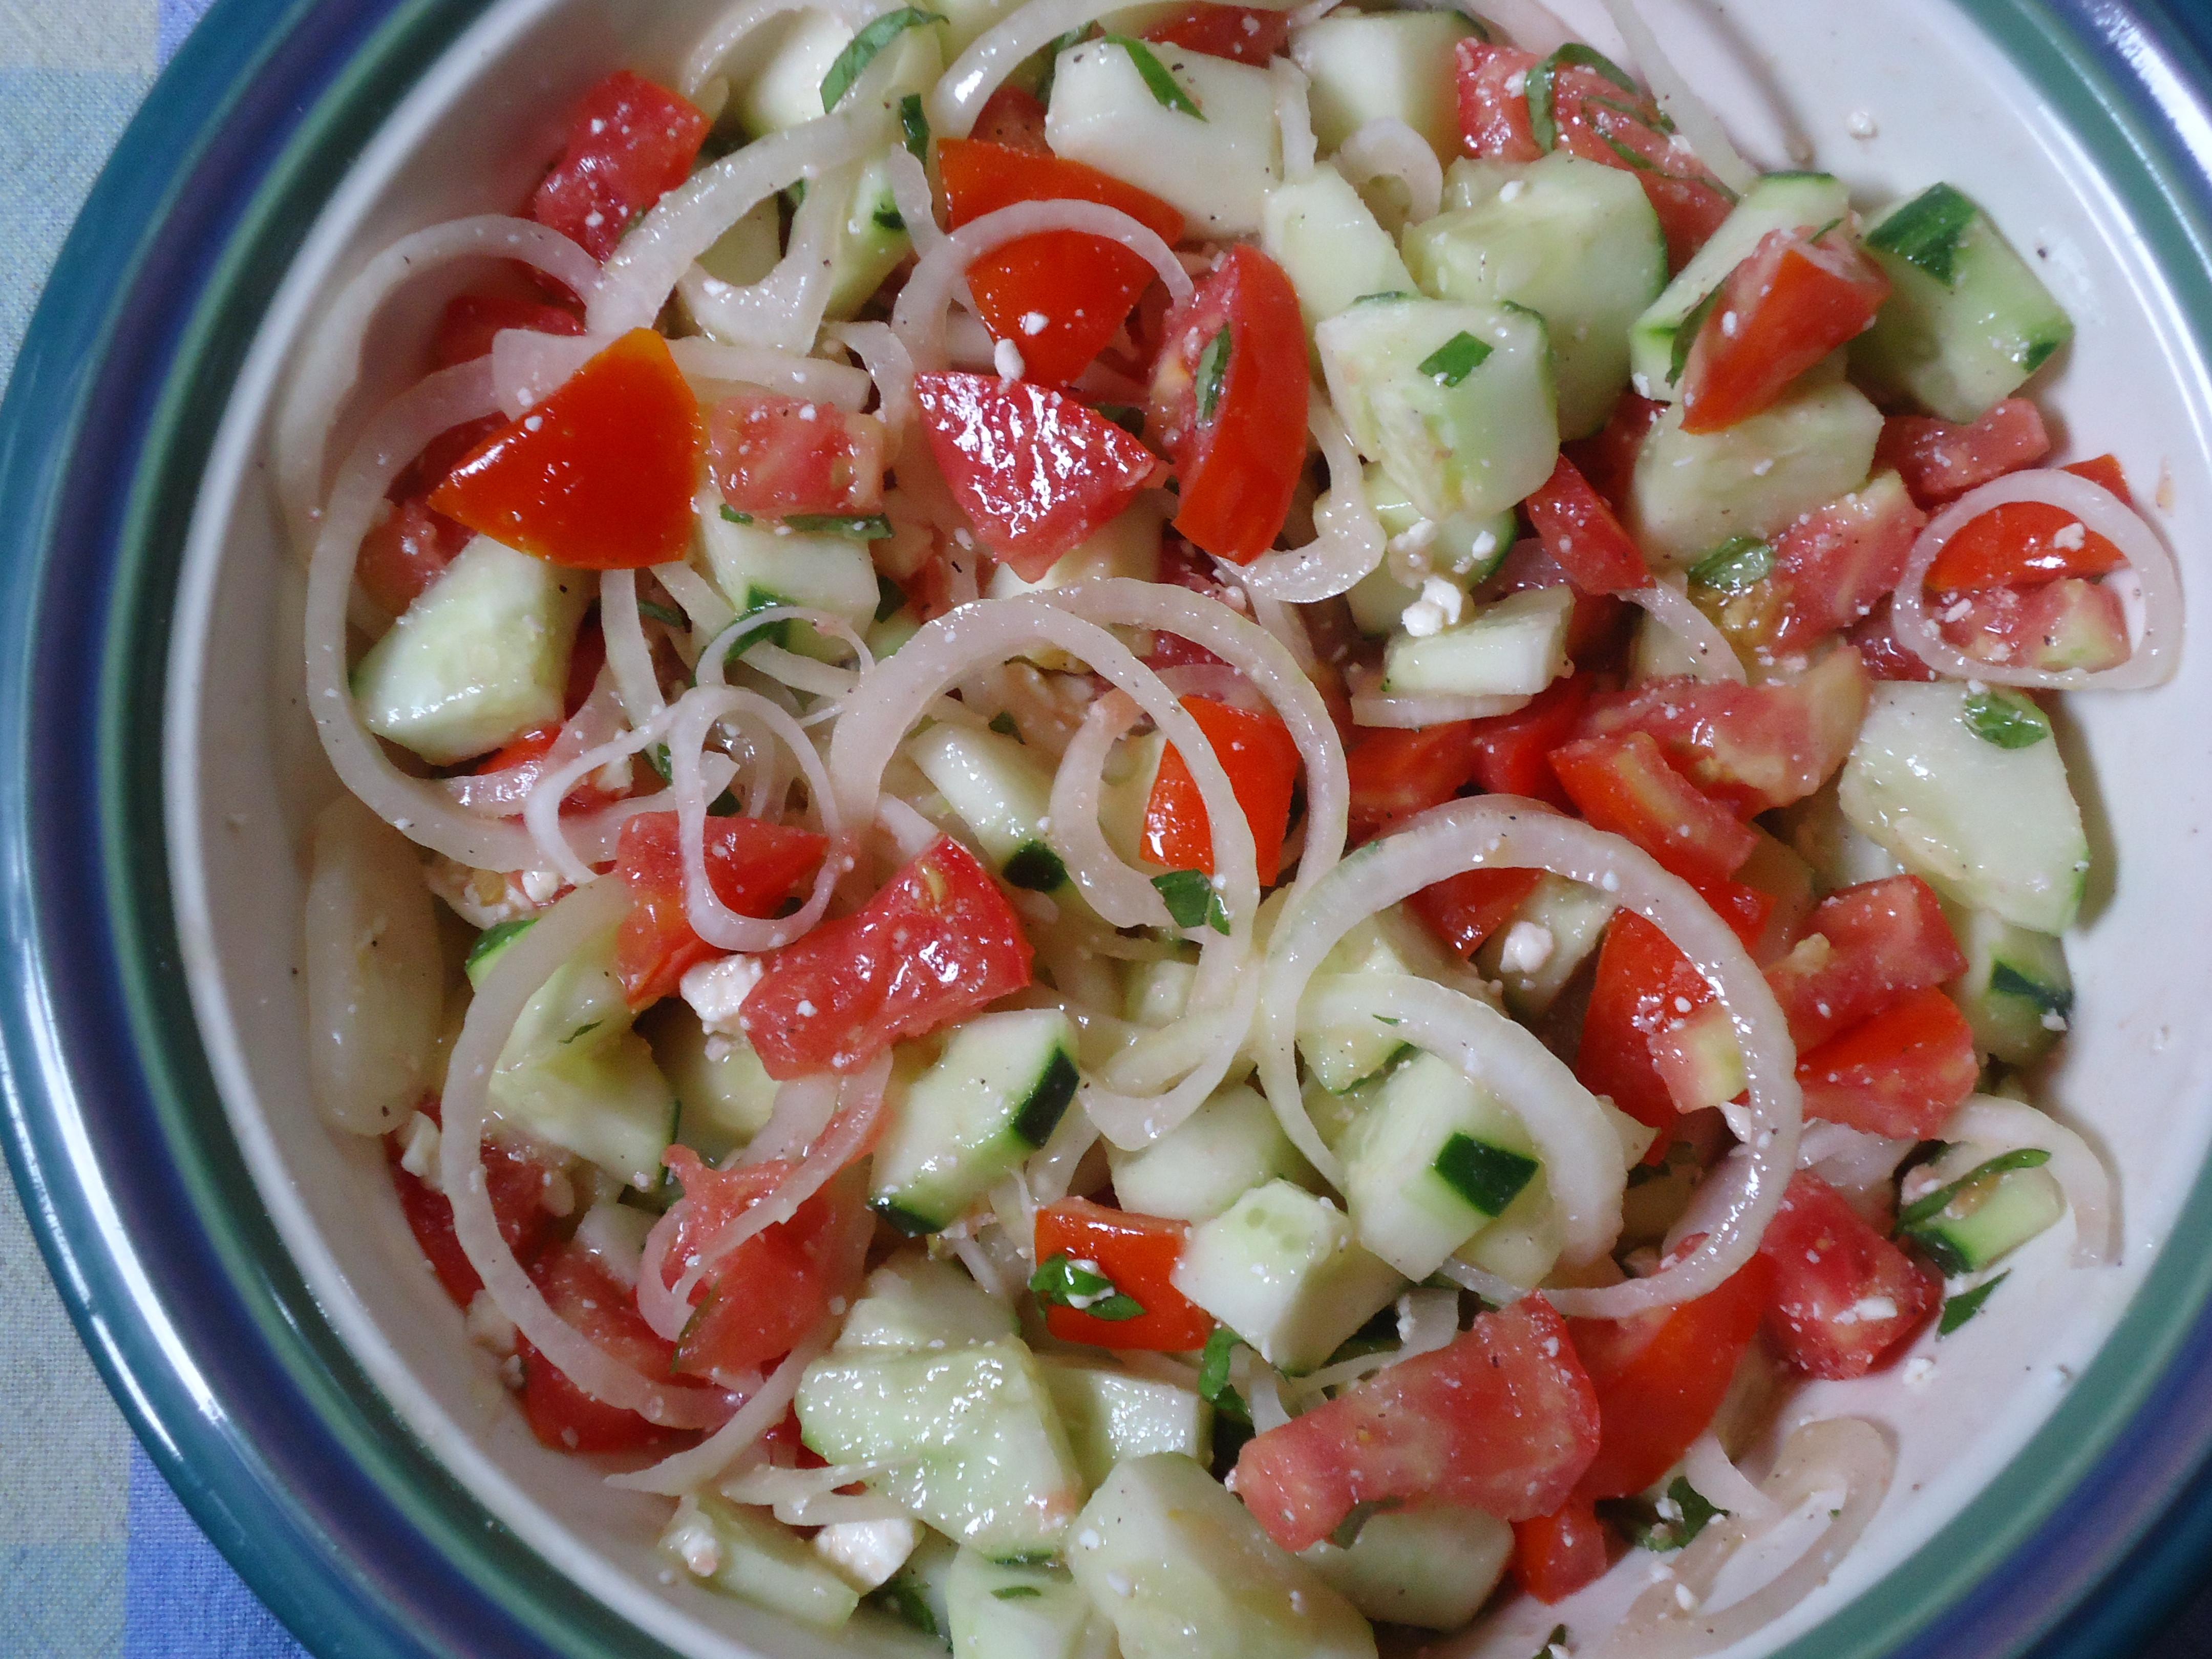 Cucumber Onion Tomato Salad  Tomato Cucumber and ion Salad